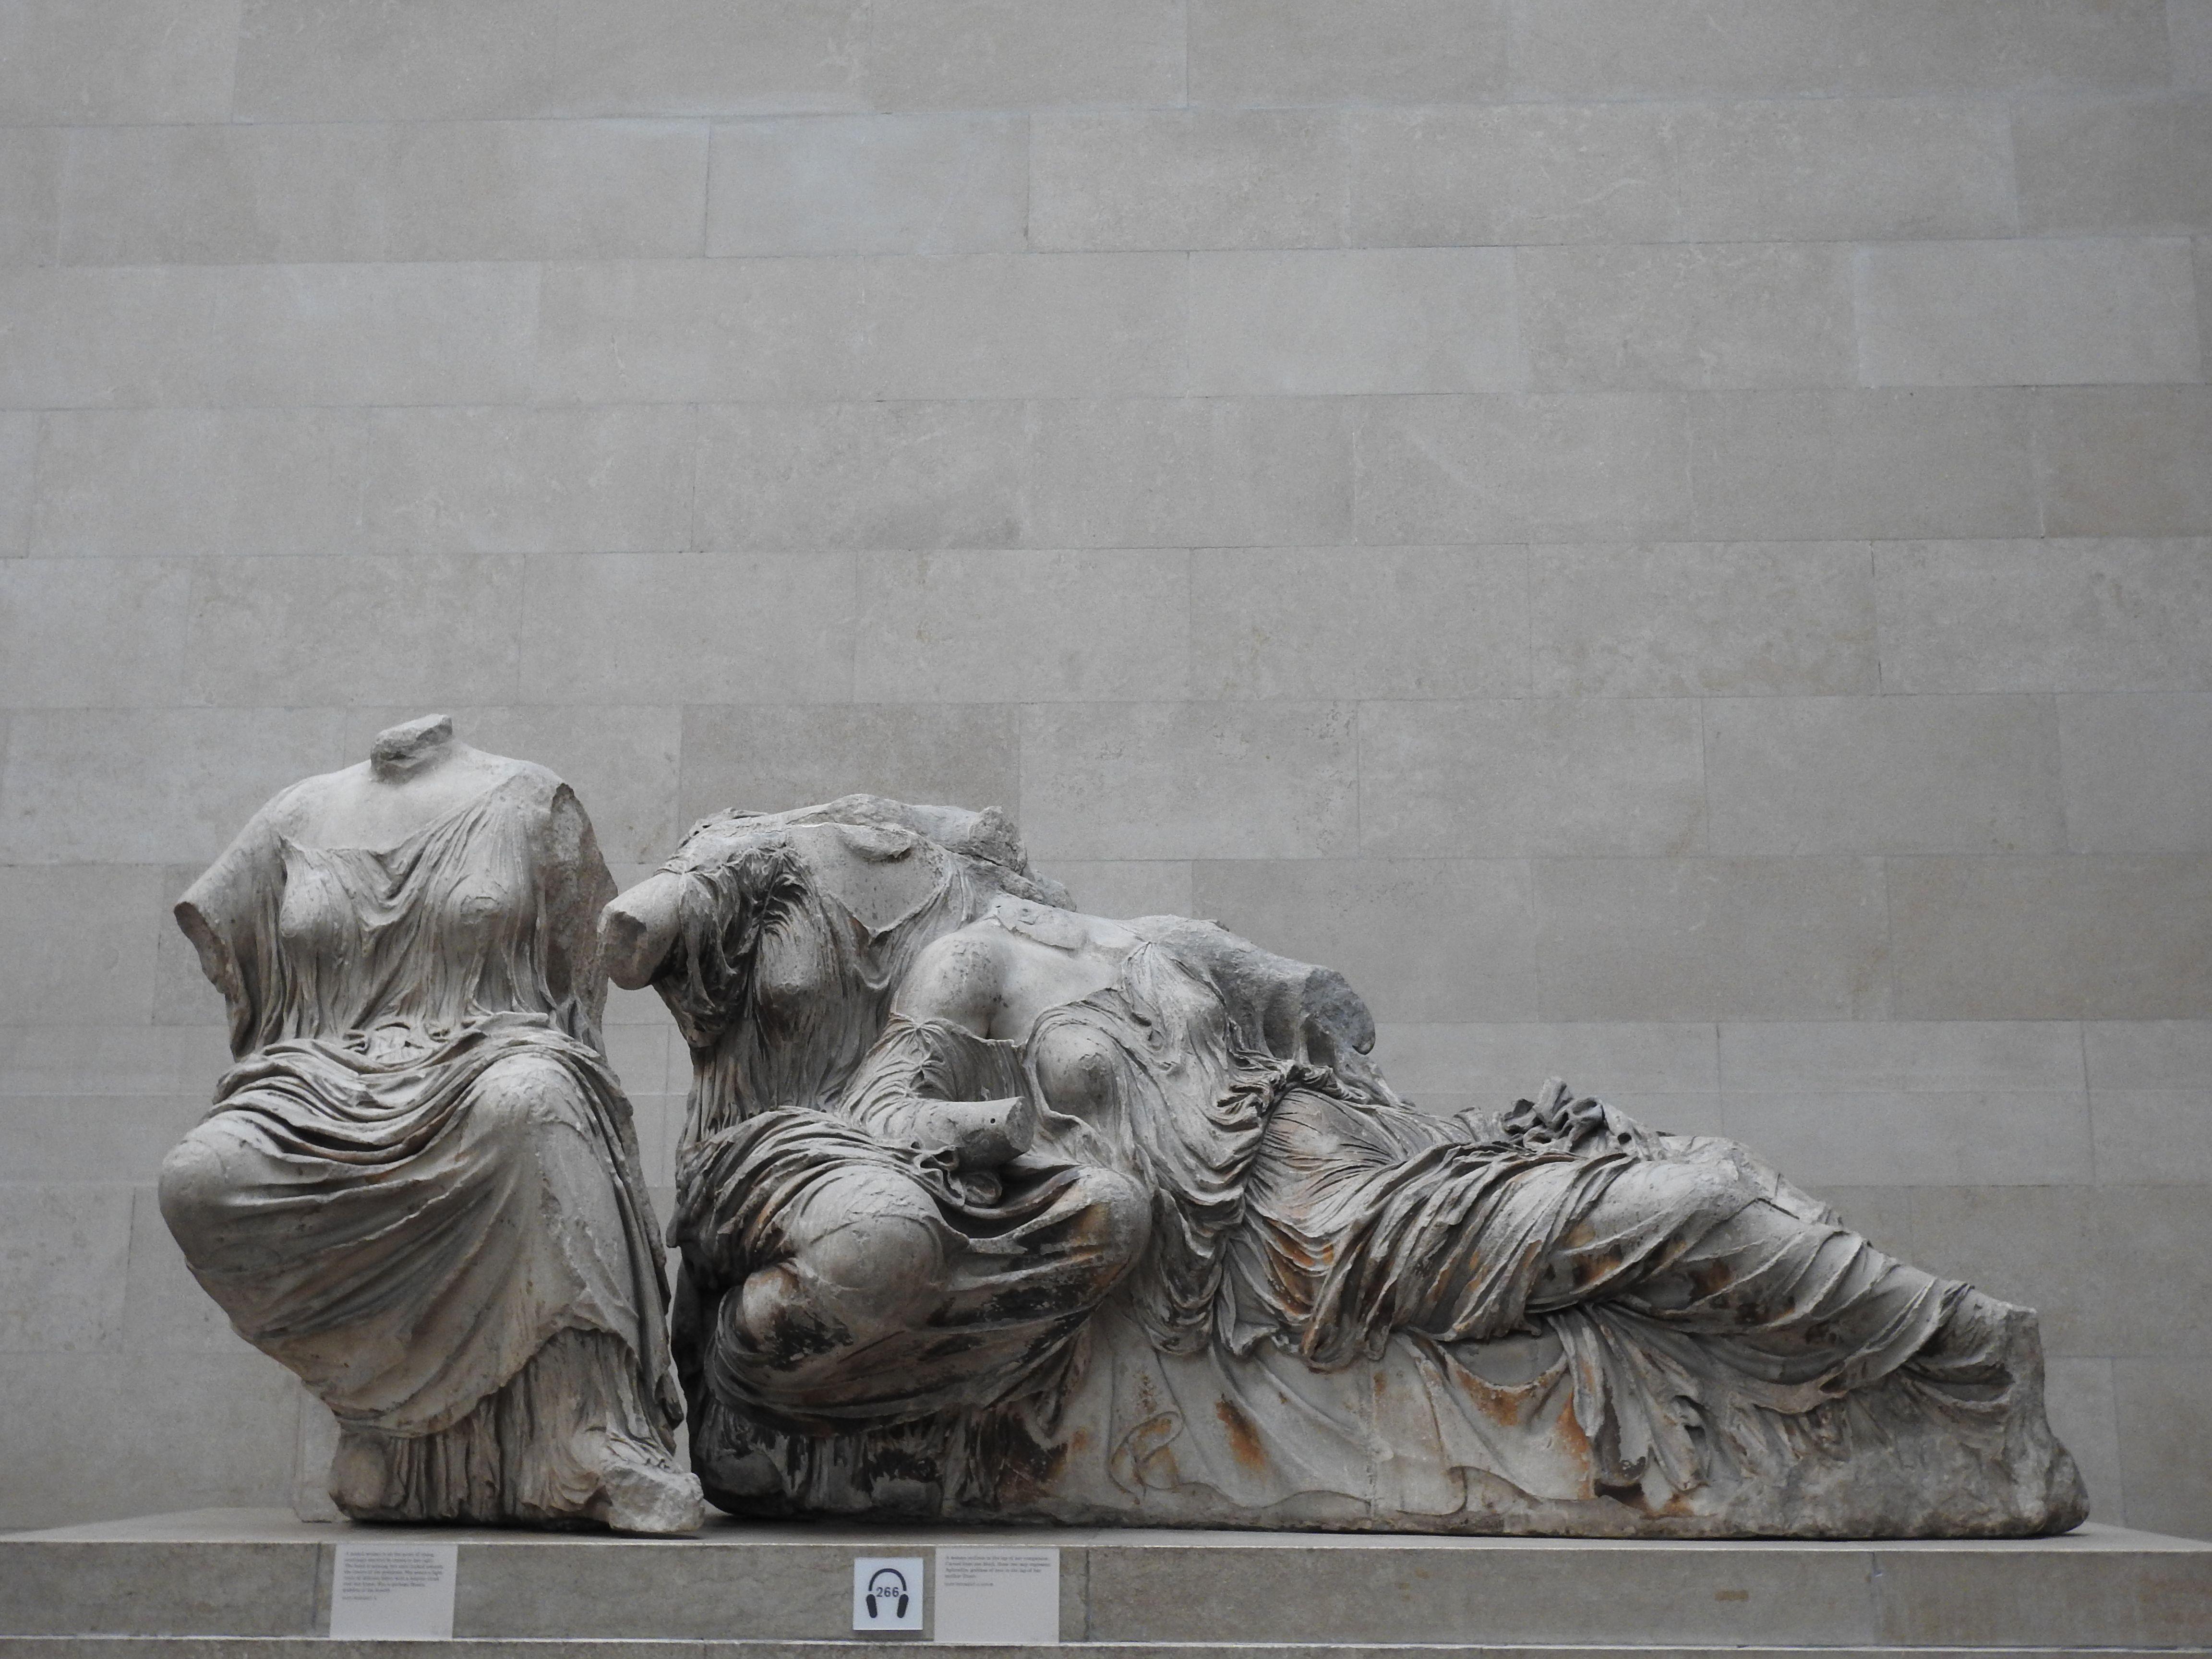 Pedimental Sculptures Taken From Parthenon Elgin Marbles Parthenon Frieze Art